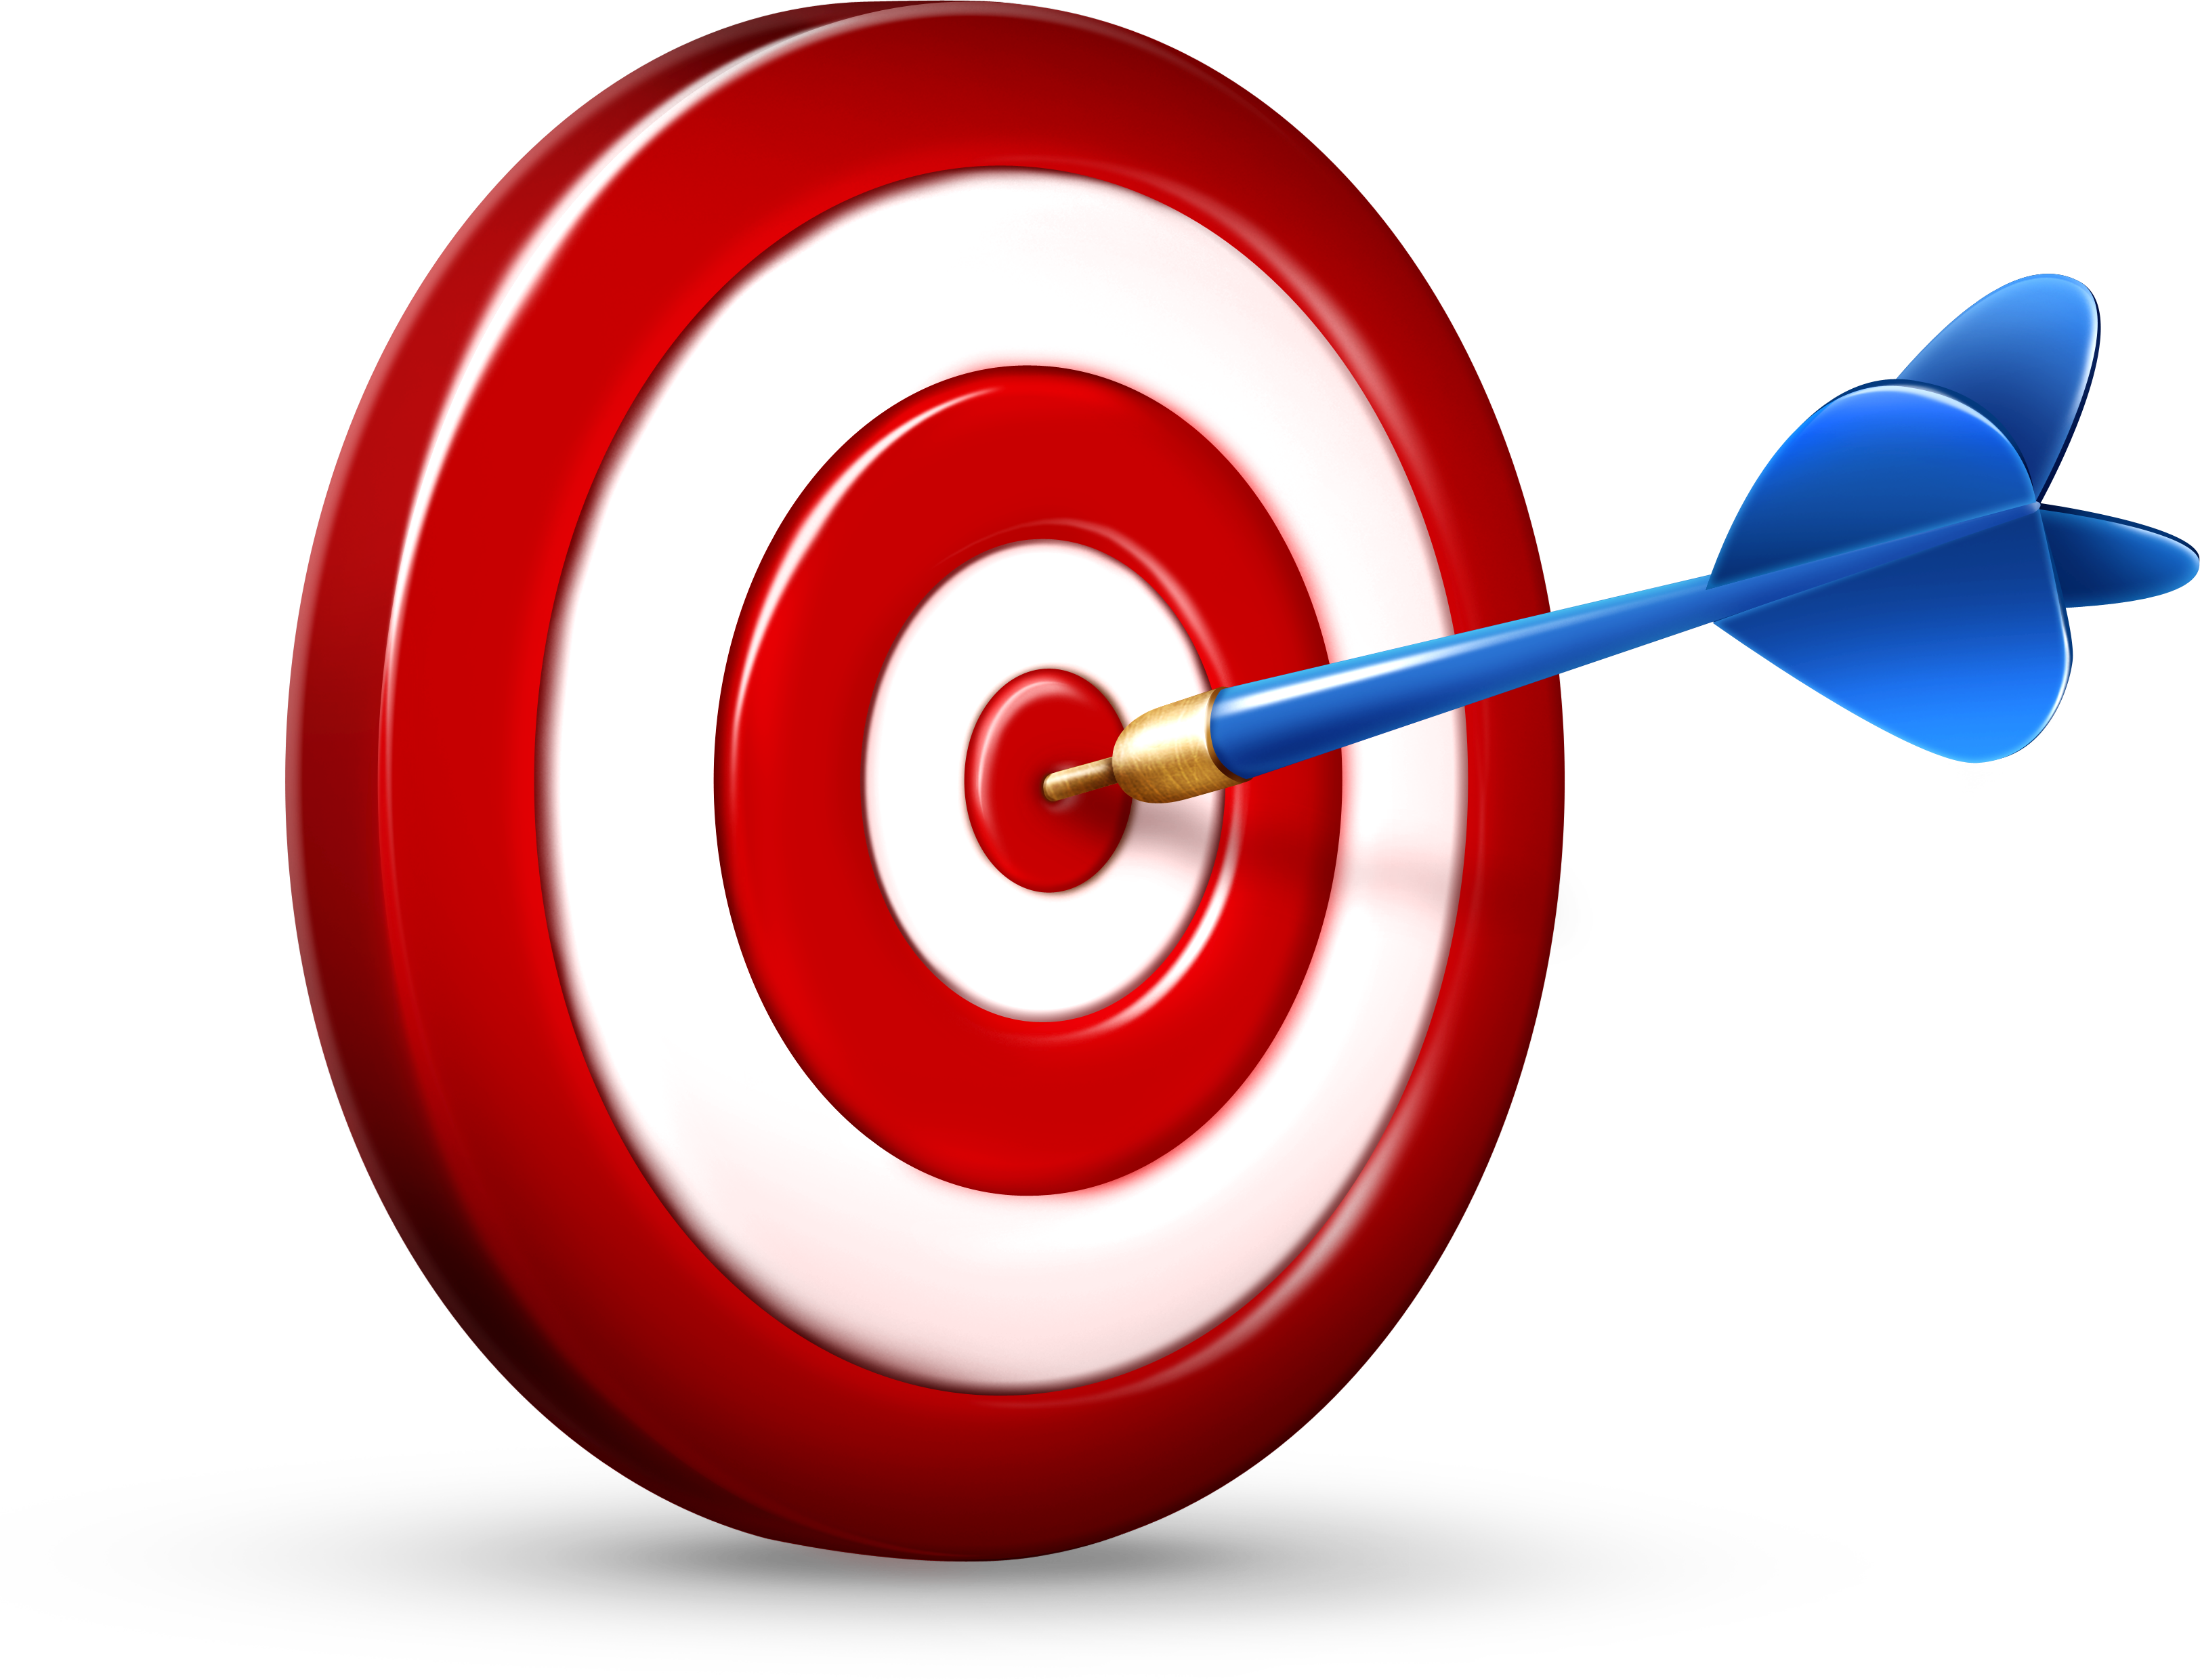 svg transparent stock Goals clipart aims. Goal png transparent images